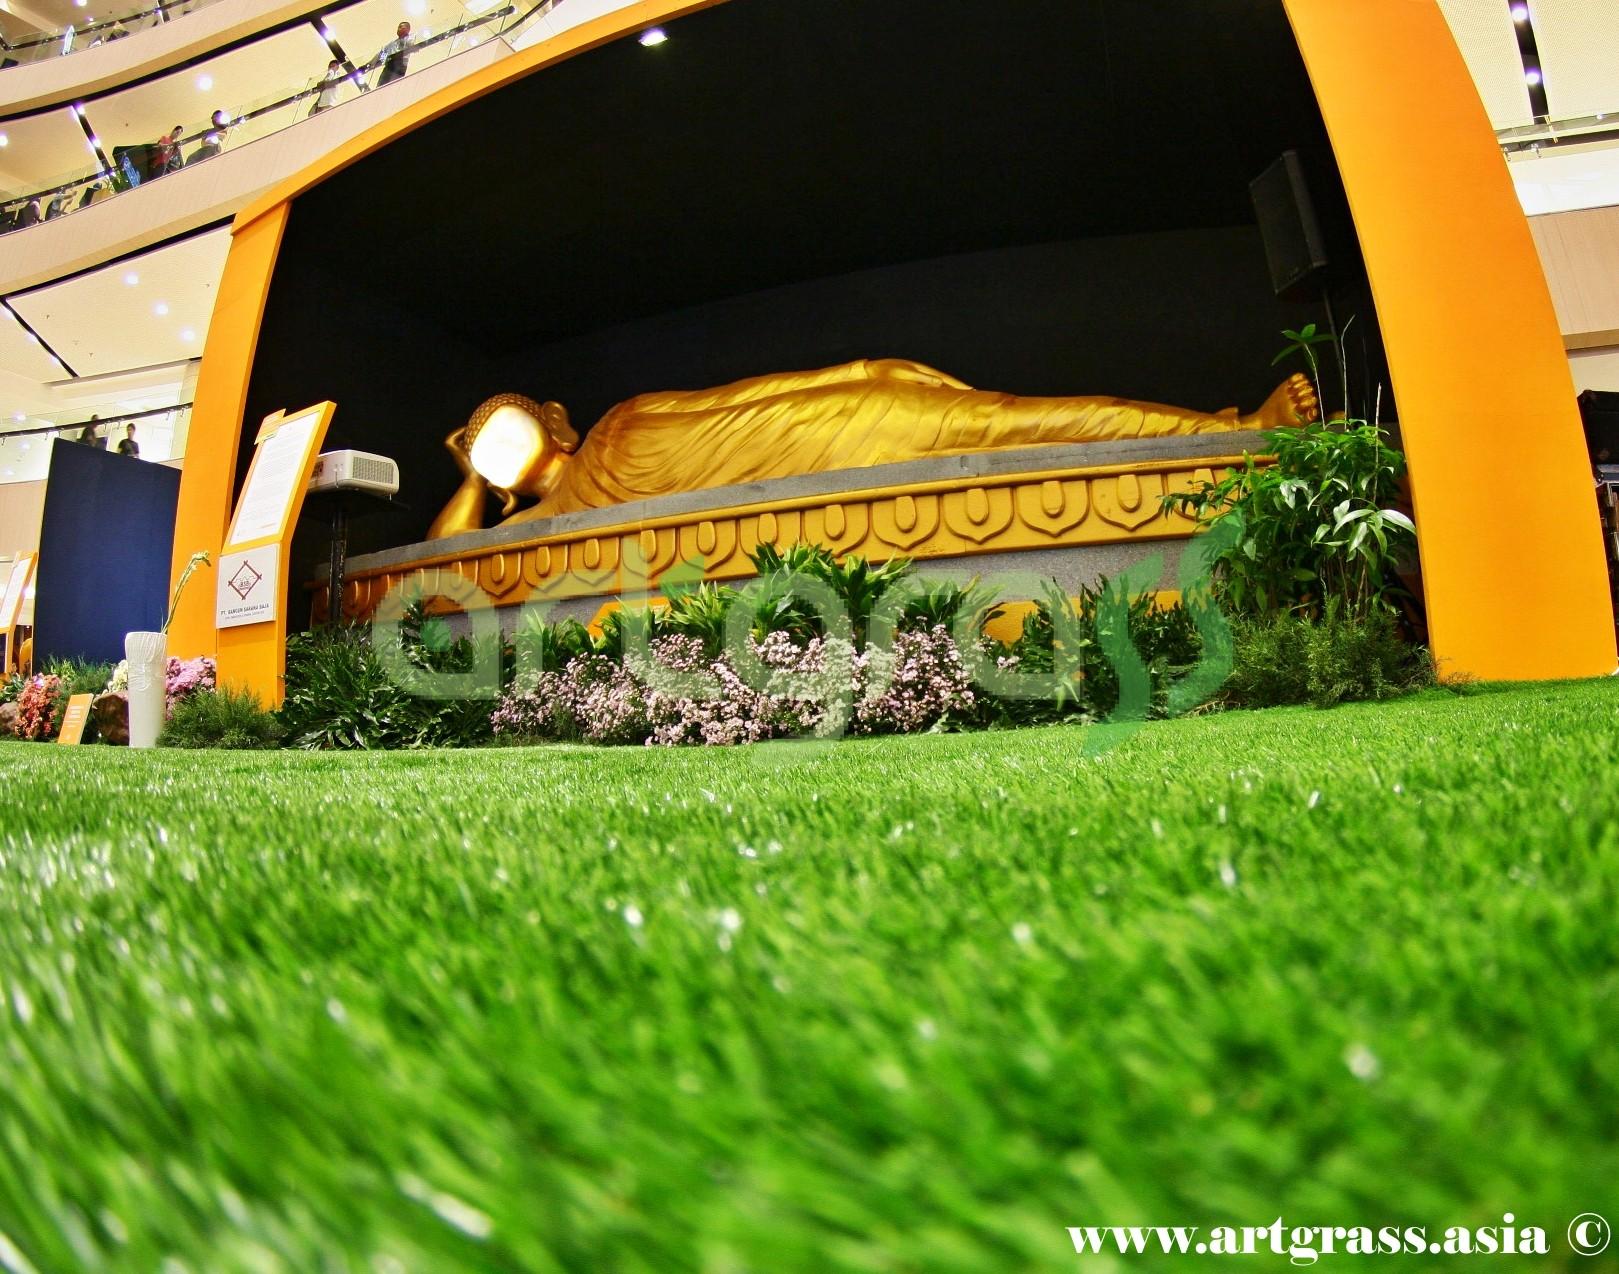 ArtGrass-At-Vesak-Festival-2015-Main-Atrium-Tunjungan-Plaza-28Mei-2015-Sleeping-Buddha